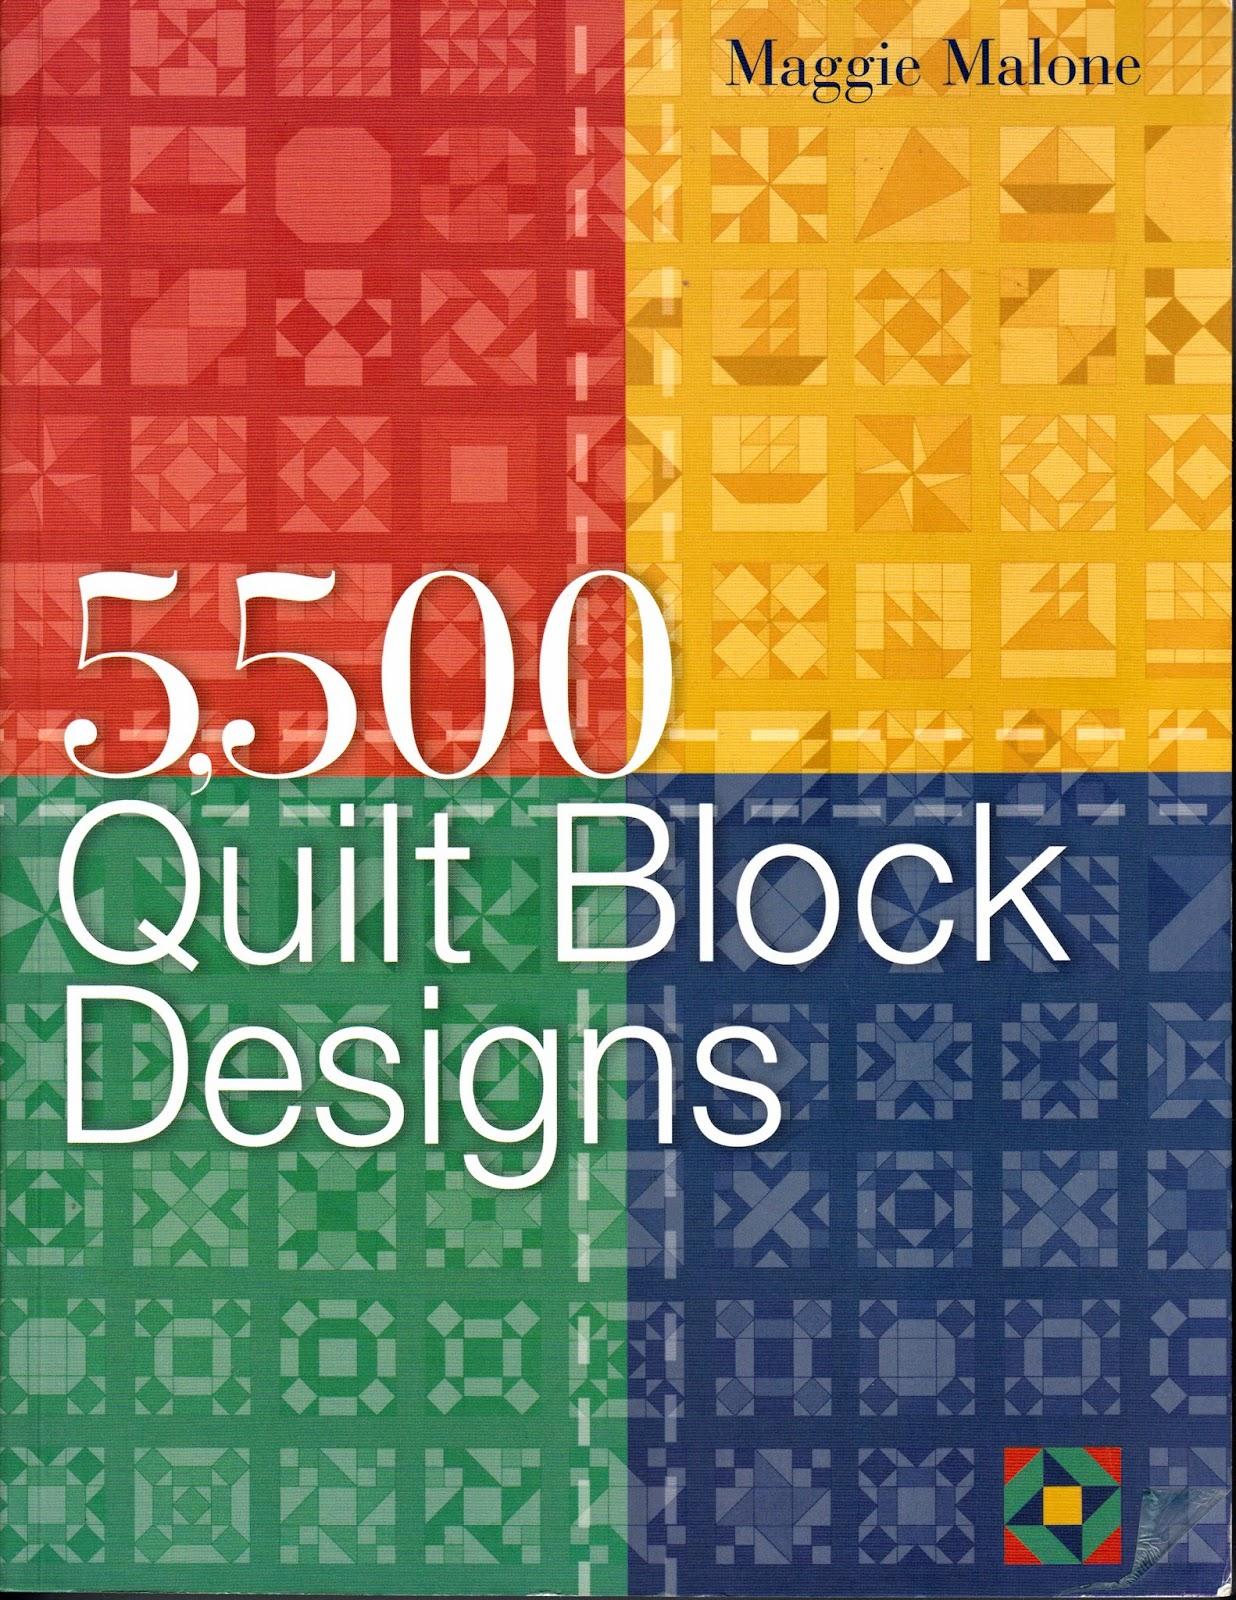 Pin Money Pursuits: 5500 Quilt Block Designs.... : 5500 quilt block designs - Adamdwight.com